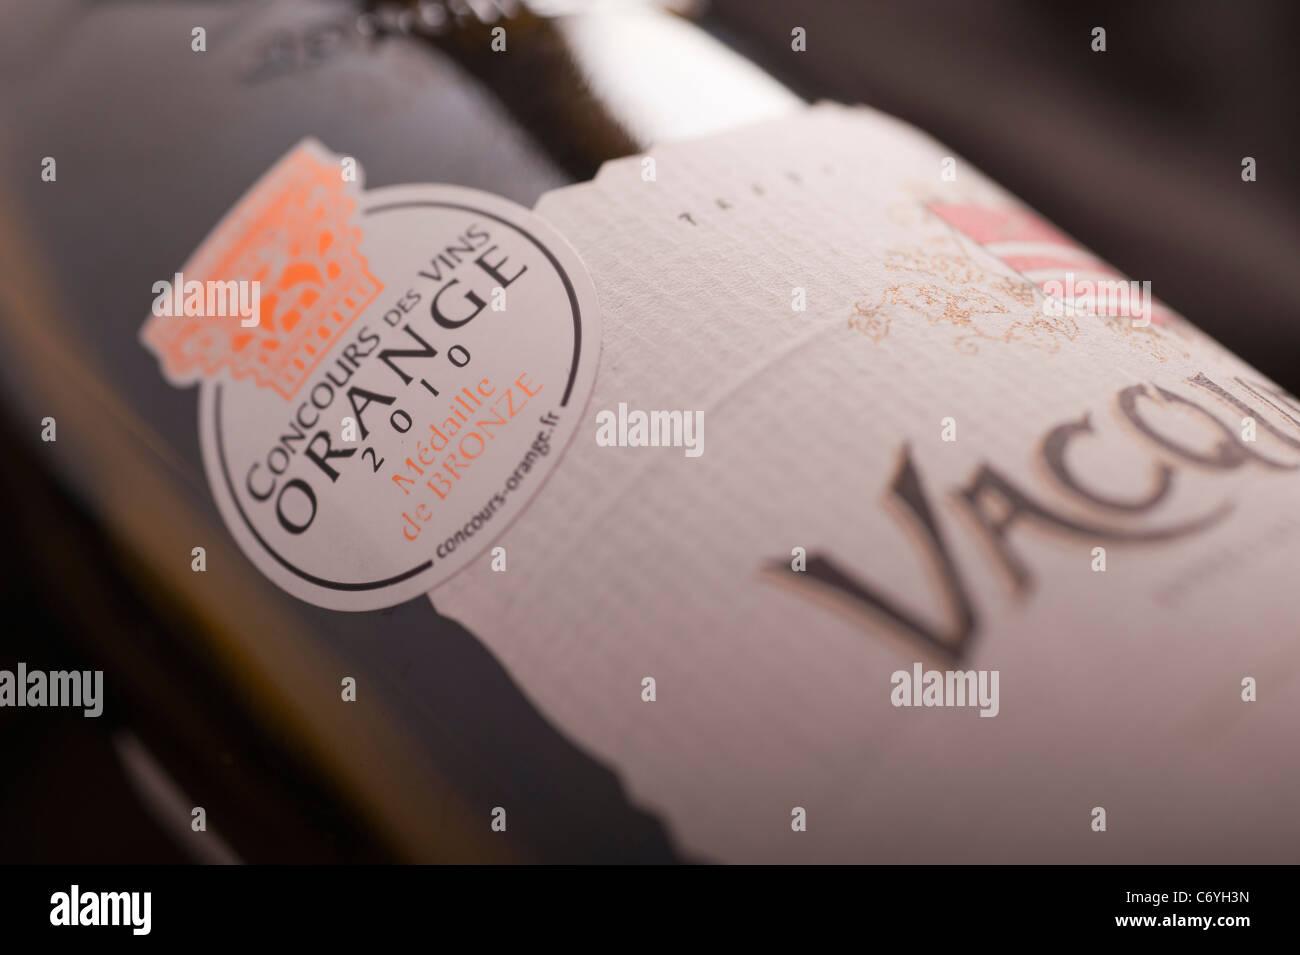 Bronze Medal label, Concours des Vins Orange 2010 on a bottle of Remy Ferbras Vacqueyras - Stock Image